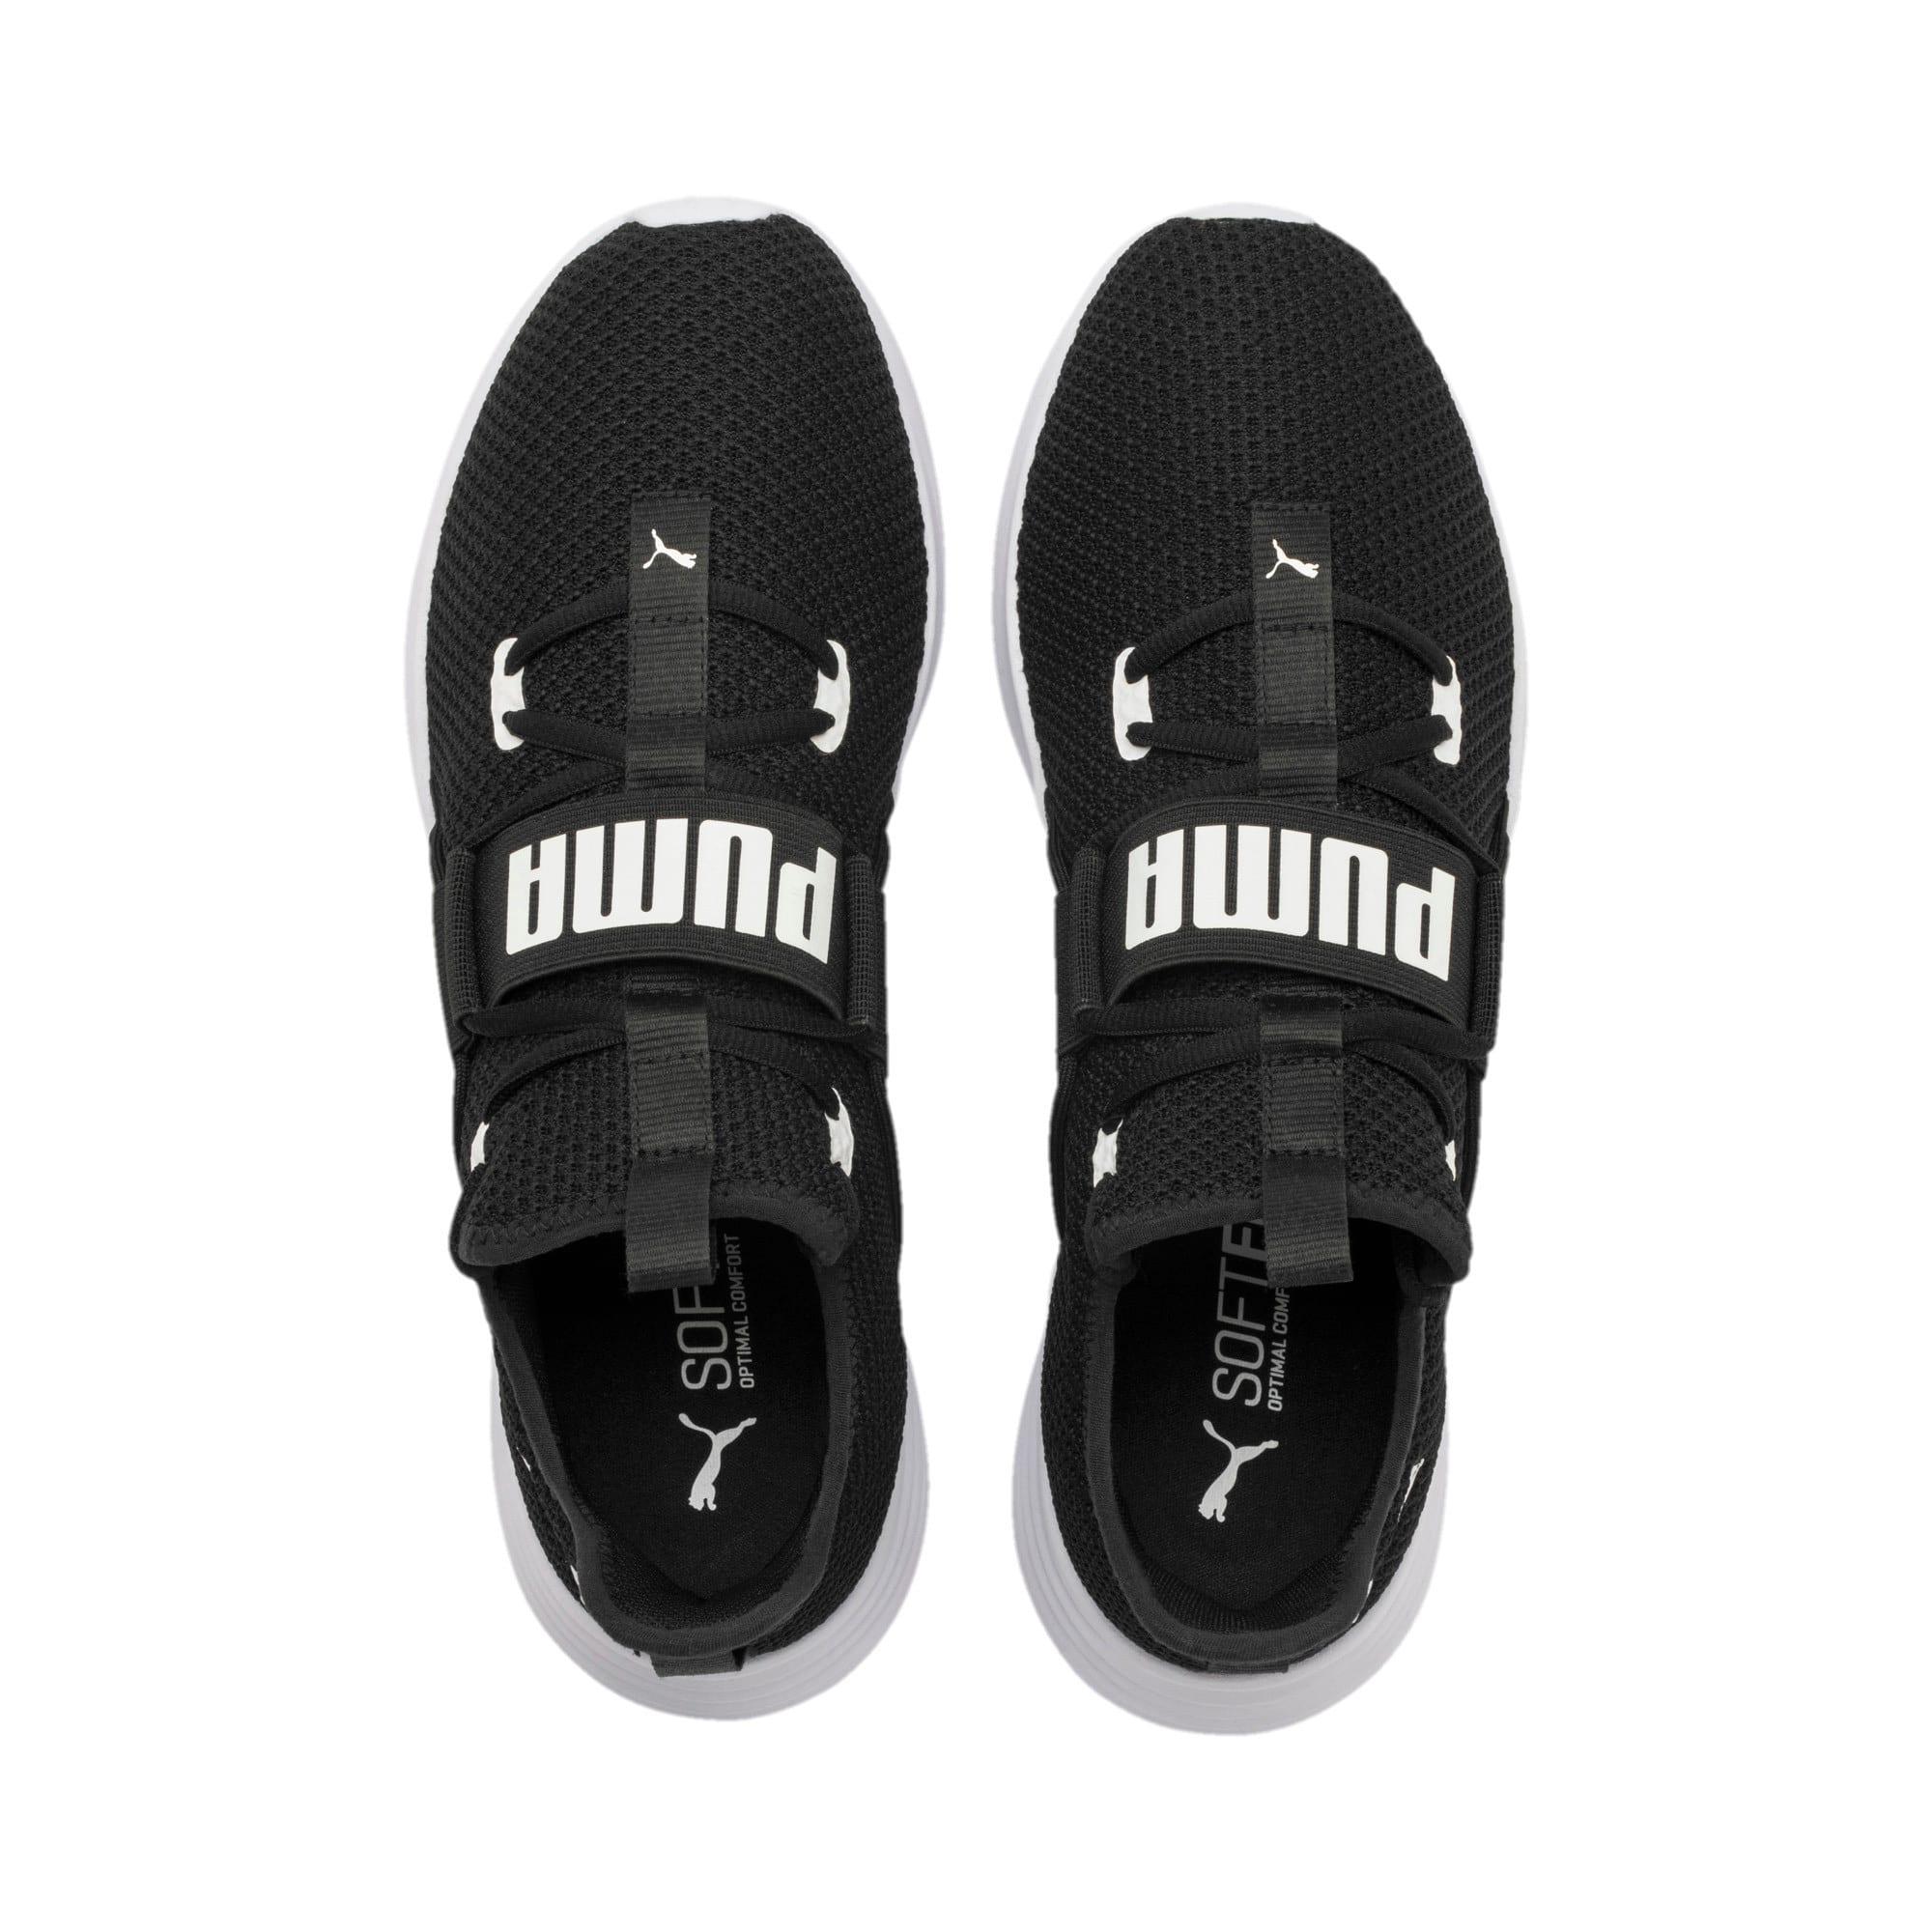 Thumbnail 7 of Persist XT Knit Men's Training Shoes, Puma Black-Puma White, medium